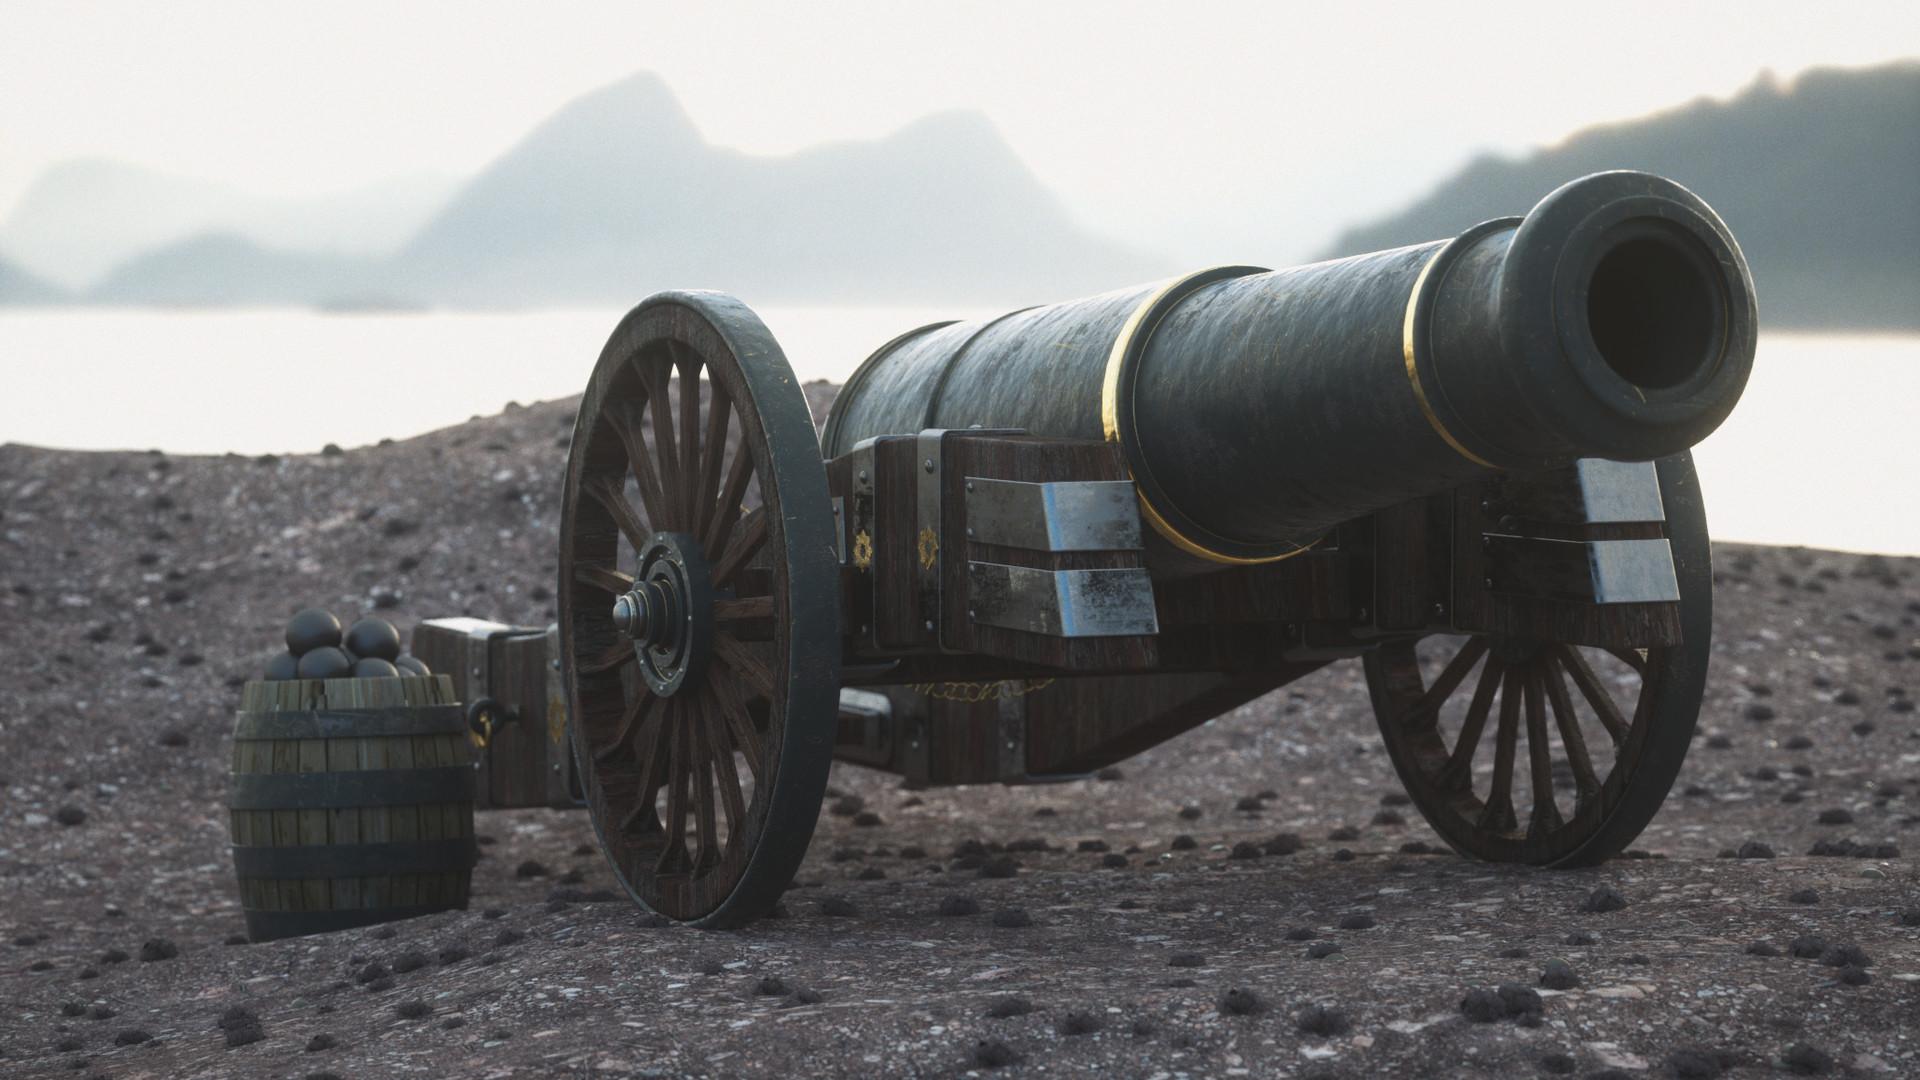 Ahmed adel cannonn